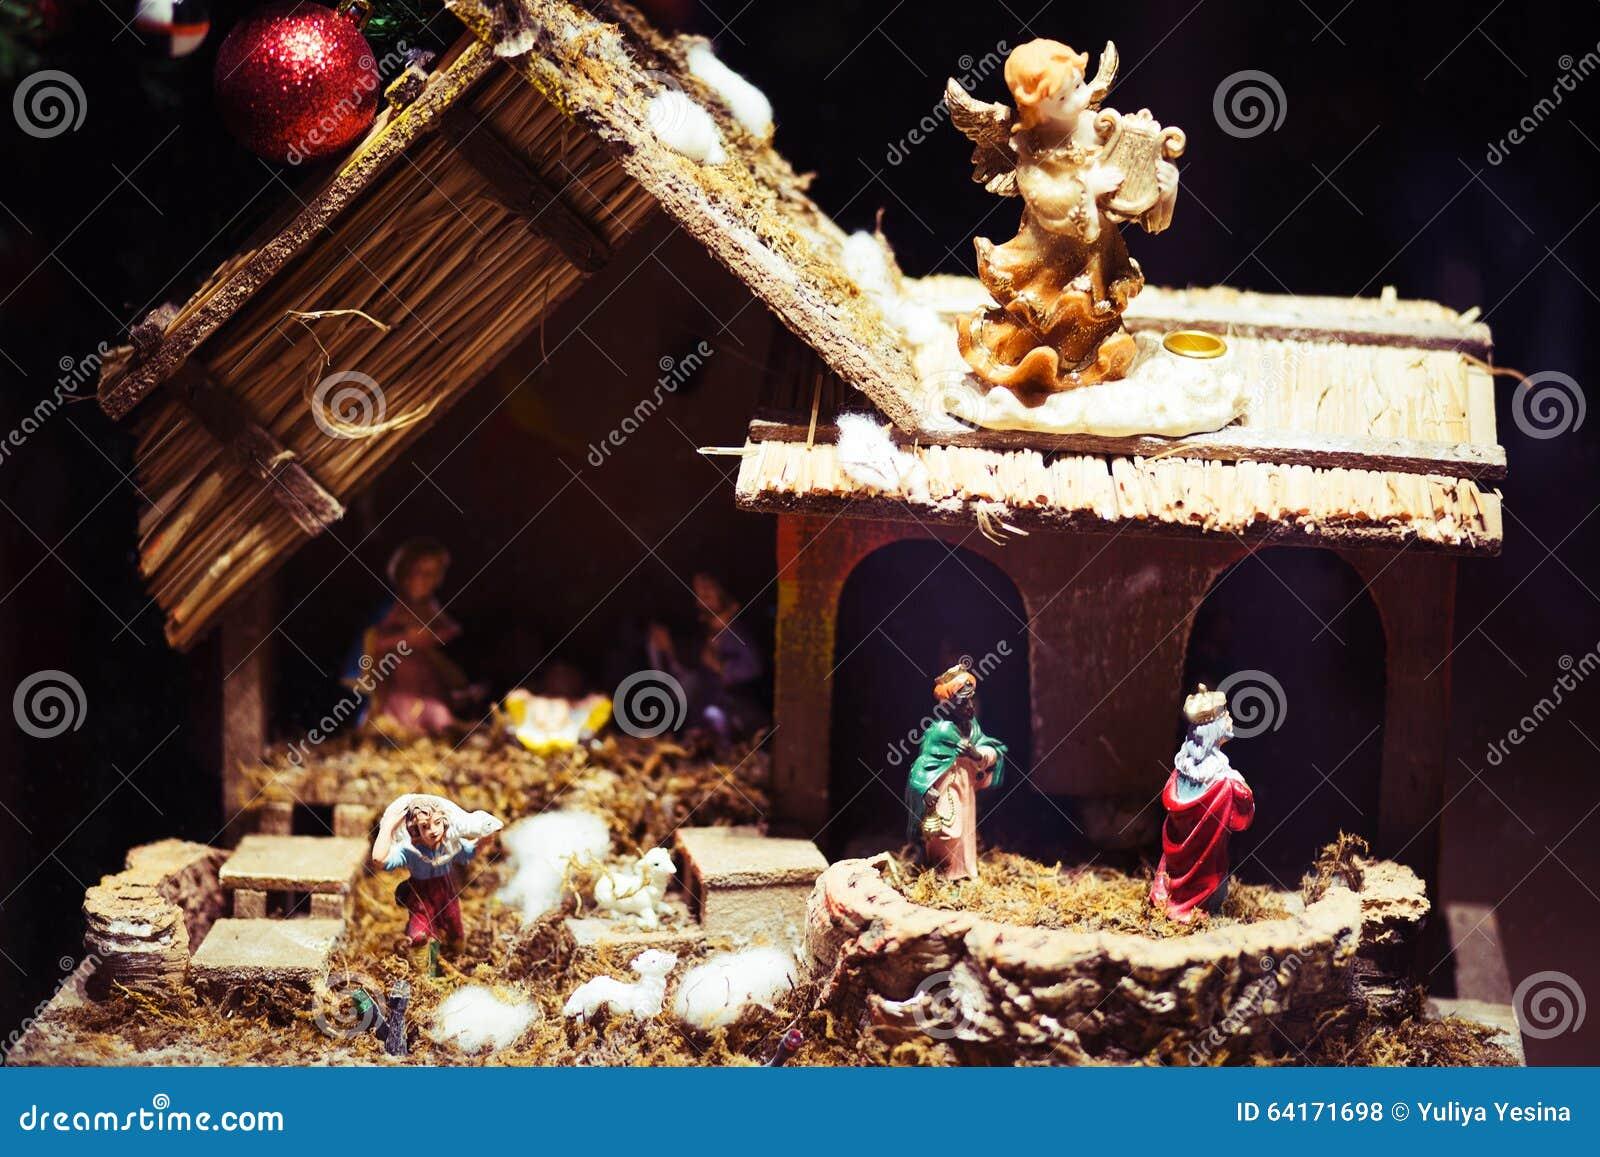 Birth Of Jesus Christ, Christmas Crib Stock Photo - Image of cave ...